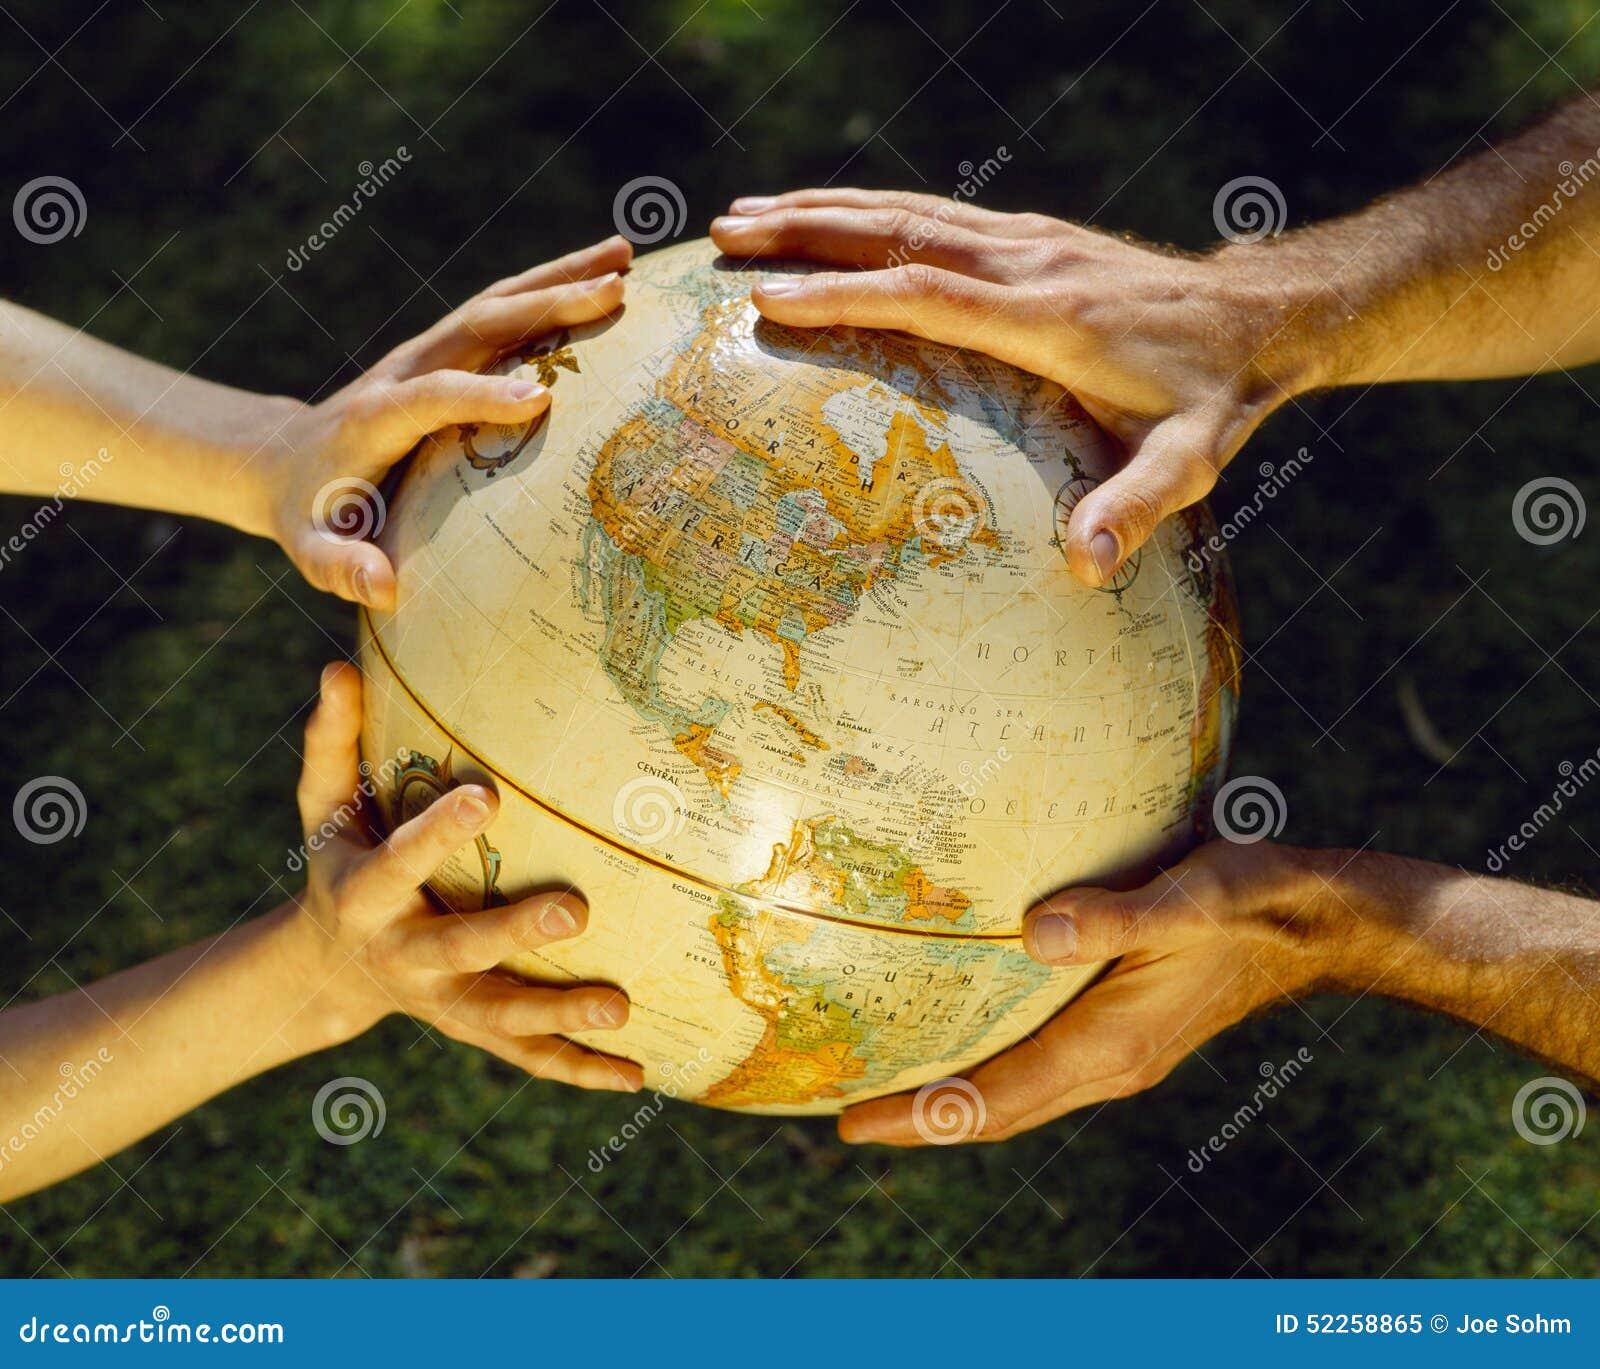 Globo in mani, cura ambientale